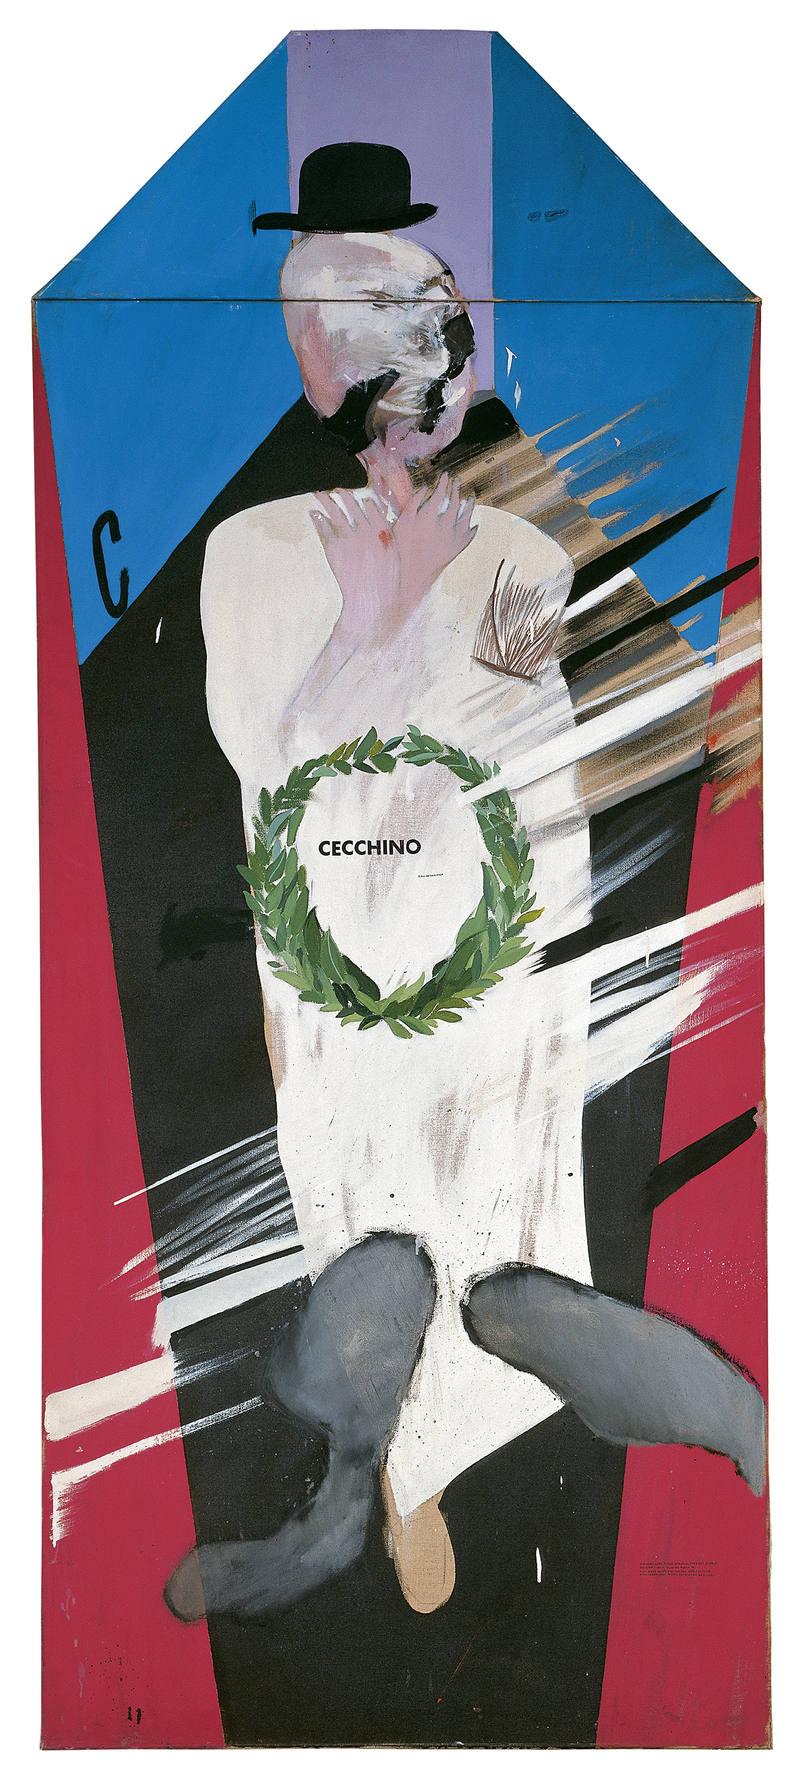 'En Memoria de Cecchino Bracci', David Hockney. Museo Thyssen-Bornemisza.